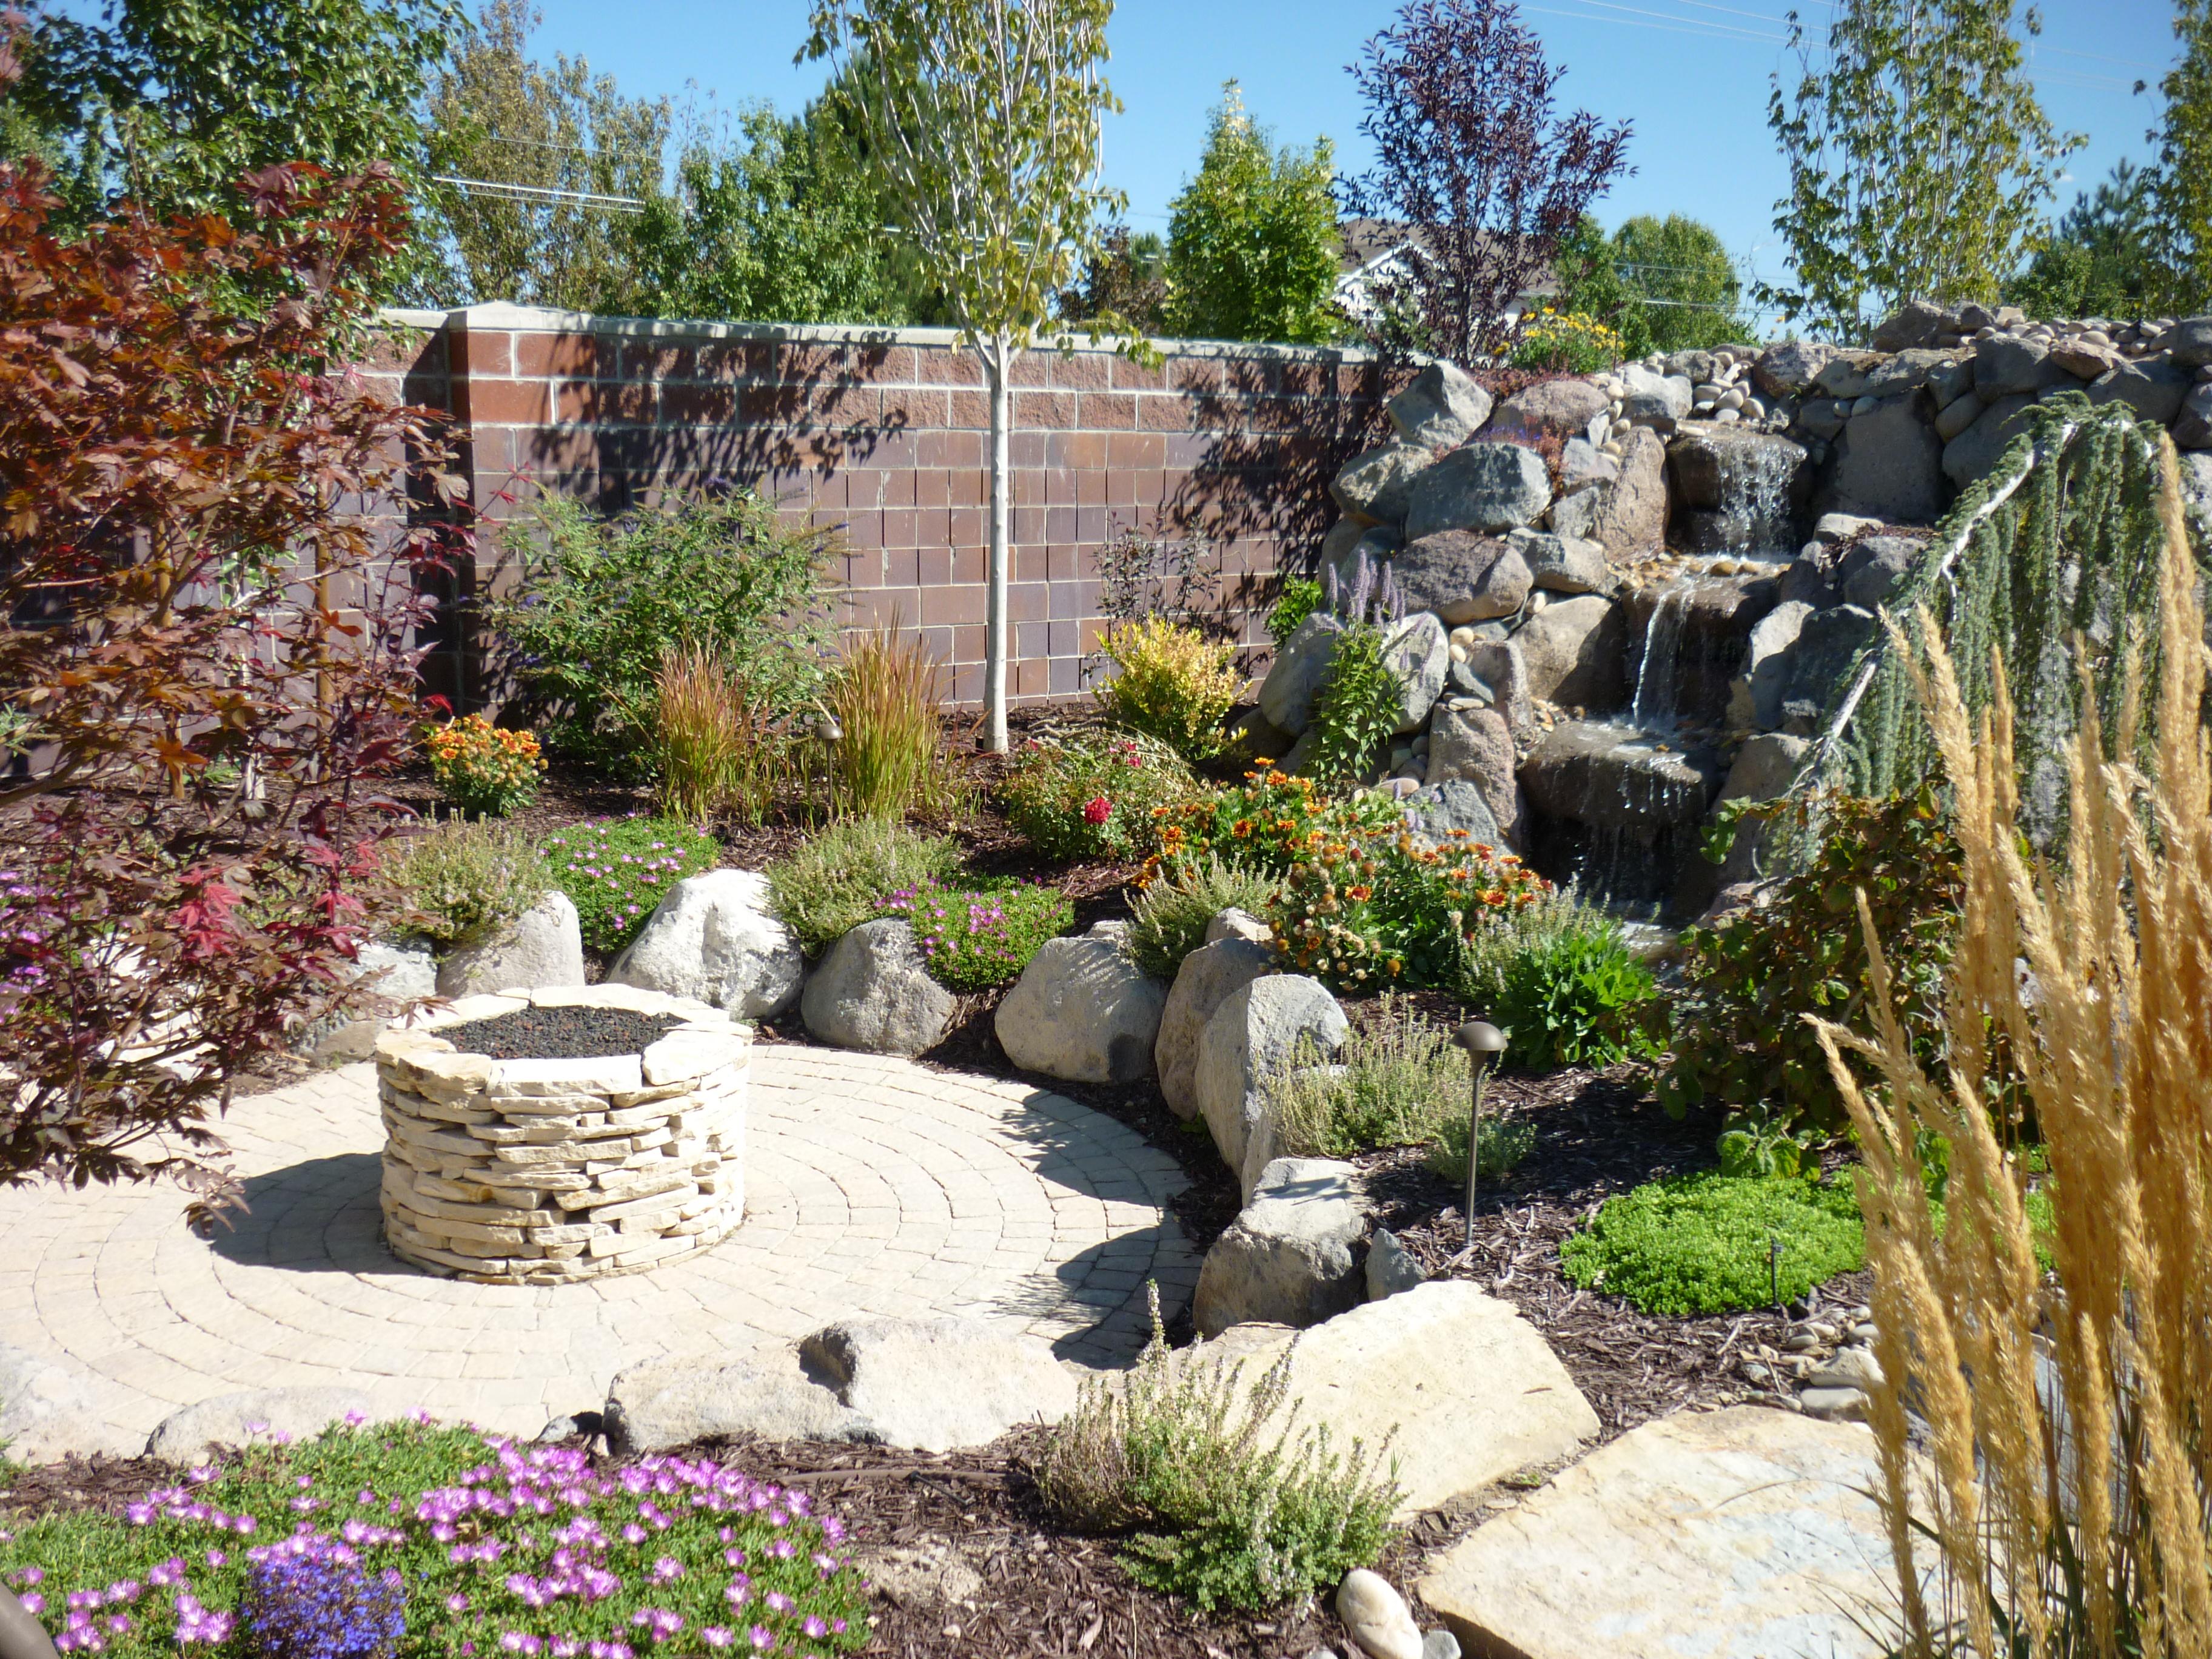 Rock stairs chris jensen landscaping in salt lake city for Landscaping rocks utah county